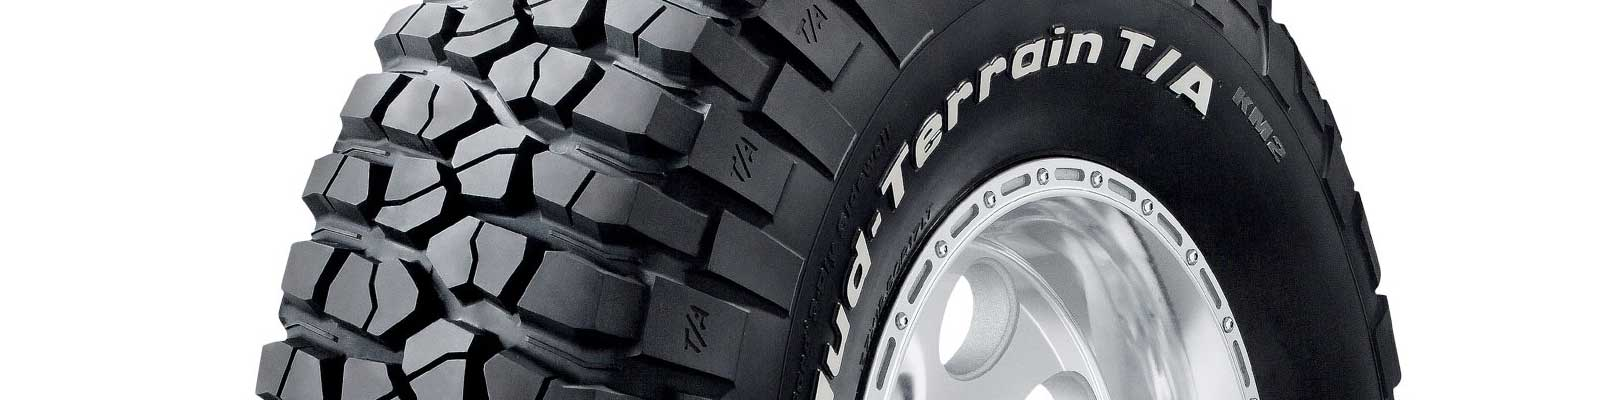 B F Goodrich Tyres